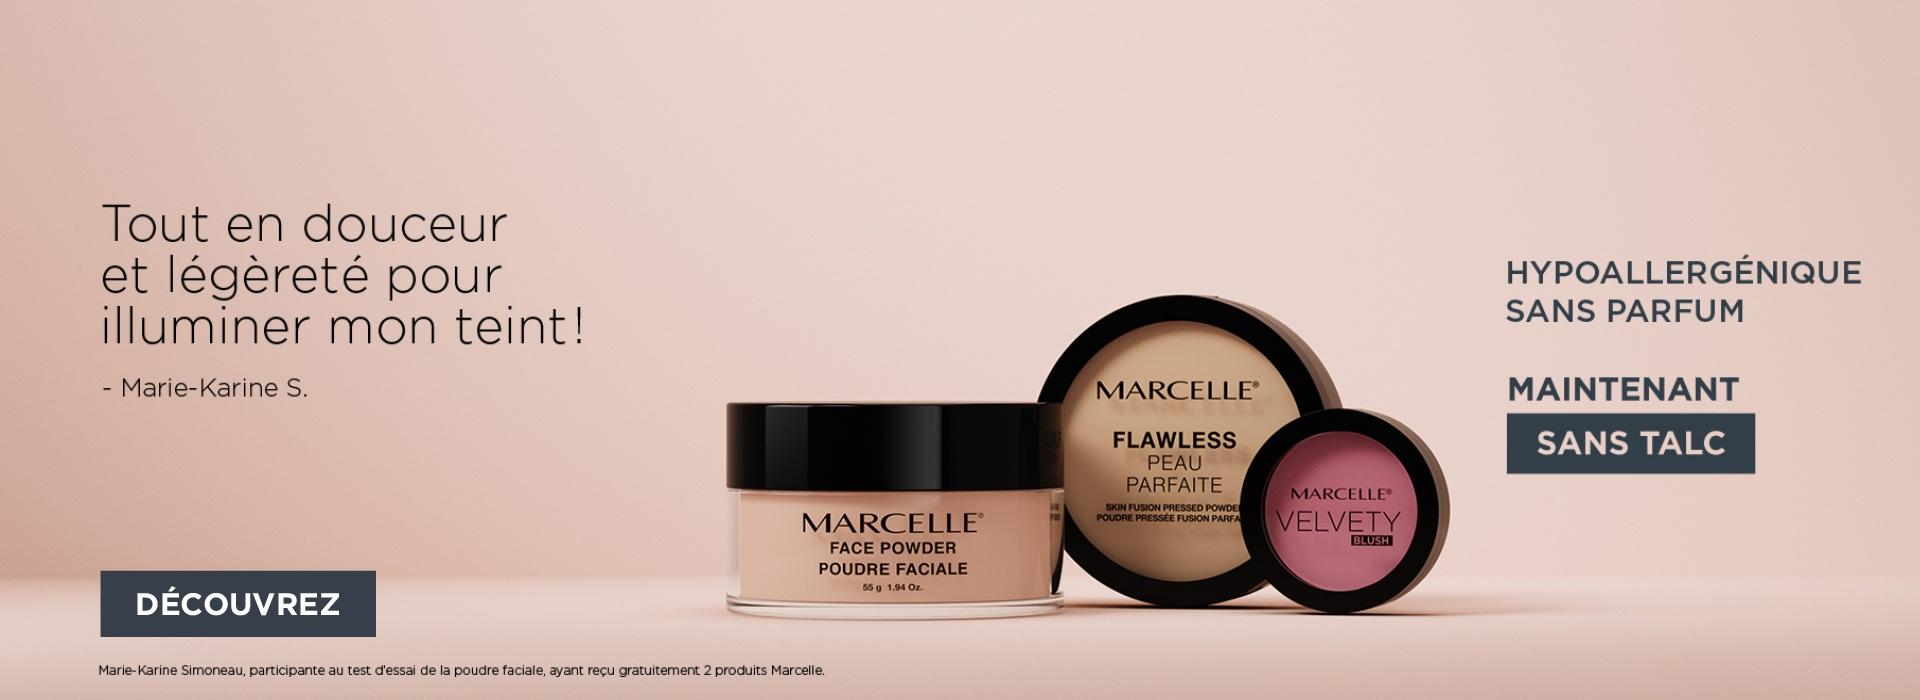 maquillage sans talc